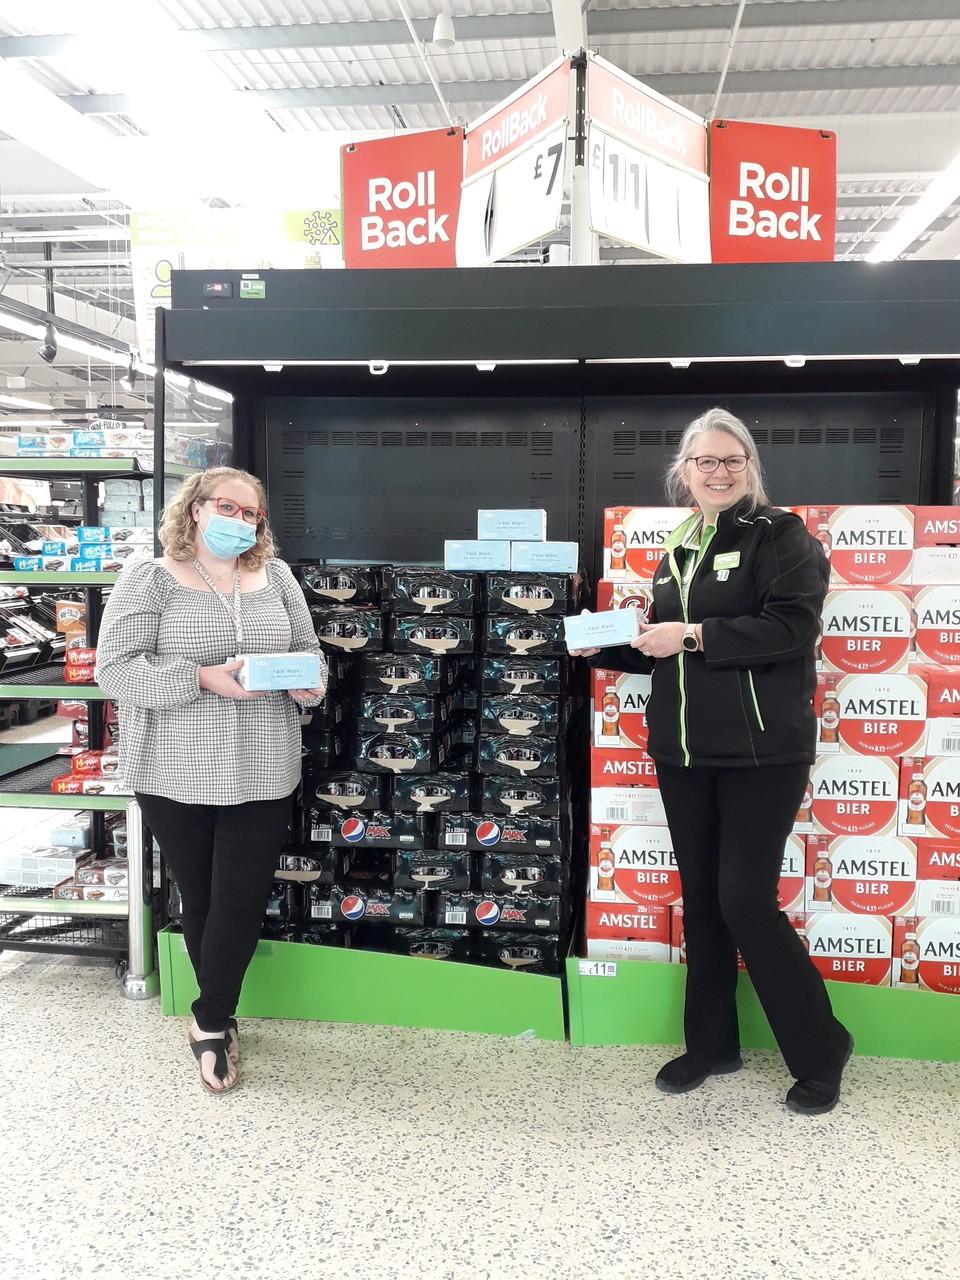 Face masks donation | Asda Gillingham Pier